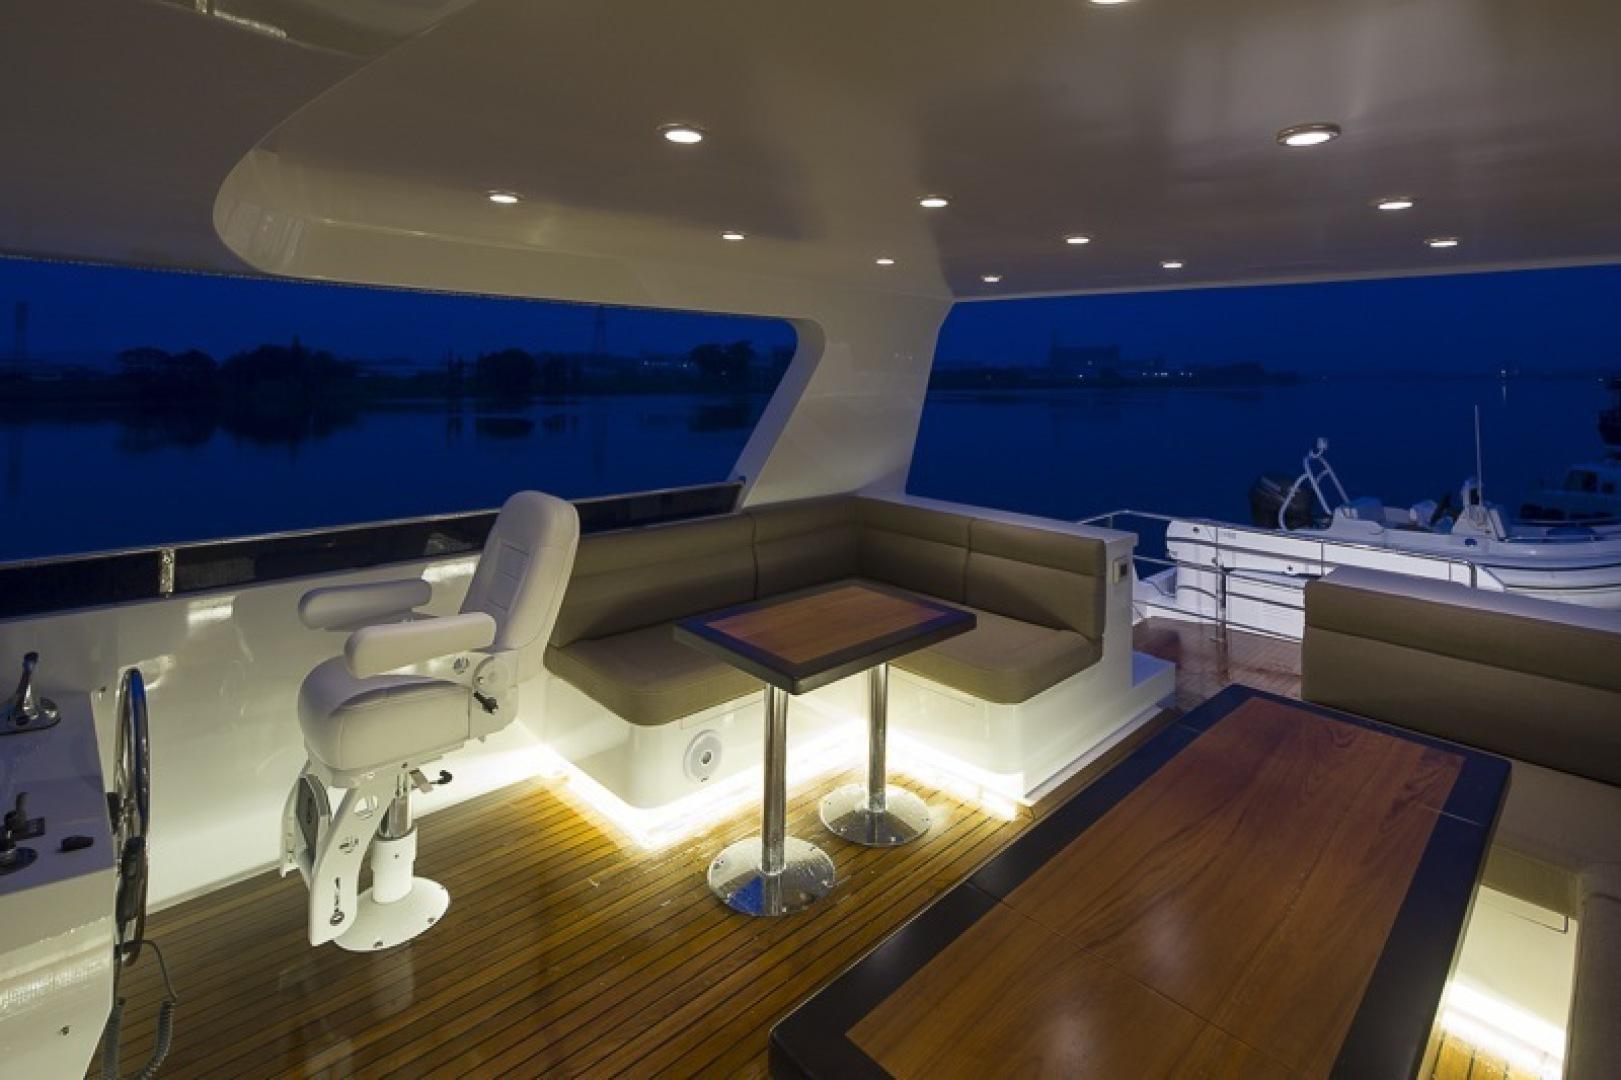 Bering-65 Bering Yacht 2013-Namaste Dania-Florida-United States-1401013   Thumbnail